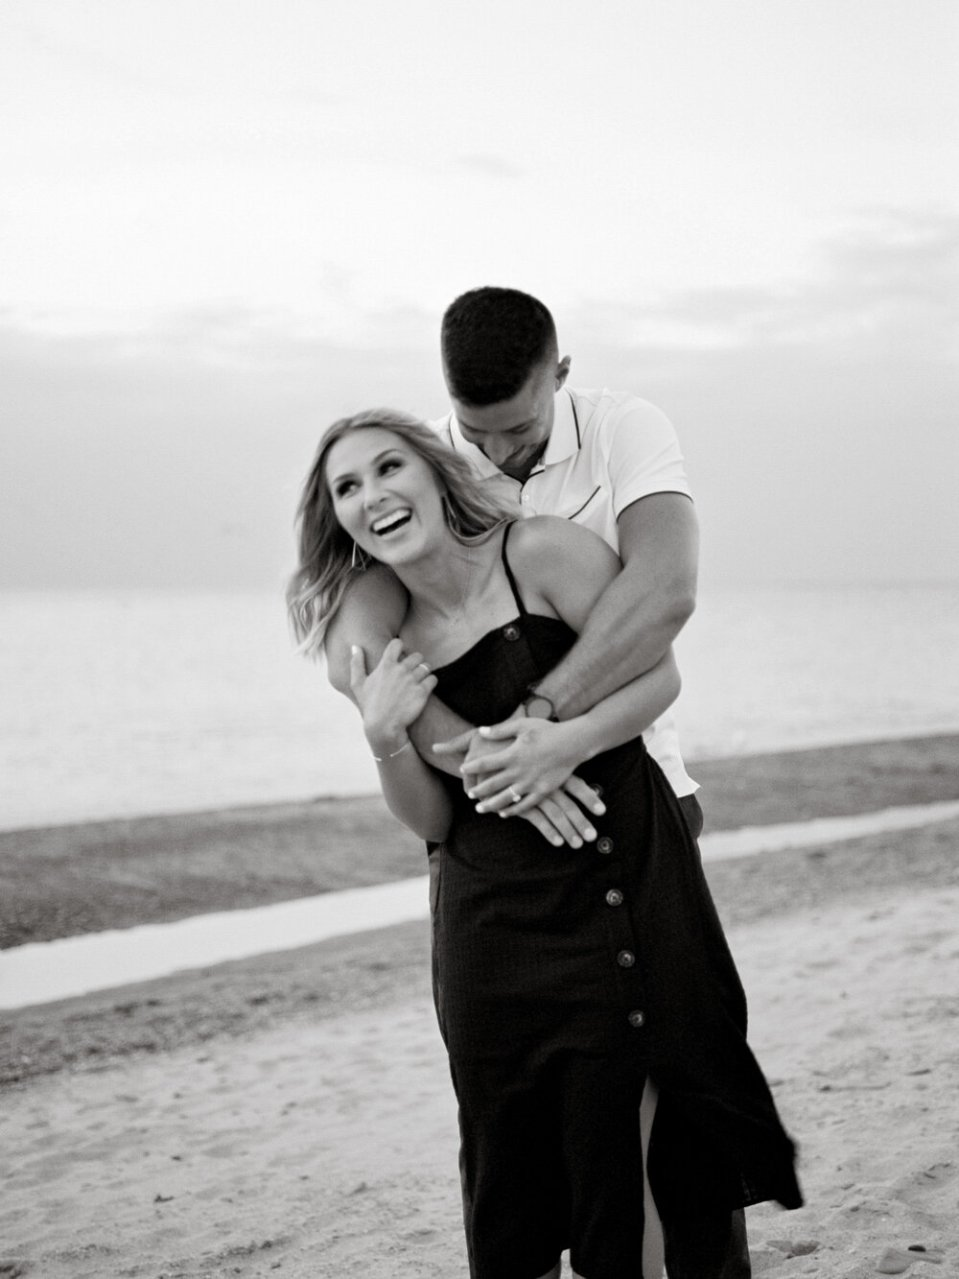 full-romantic-lake-erie-engagement-photos-by-matt-erickson-photography-62.JPG